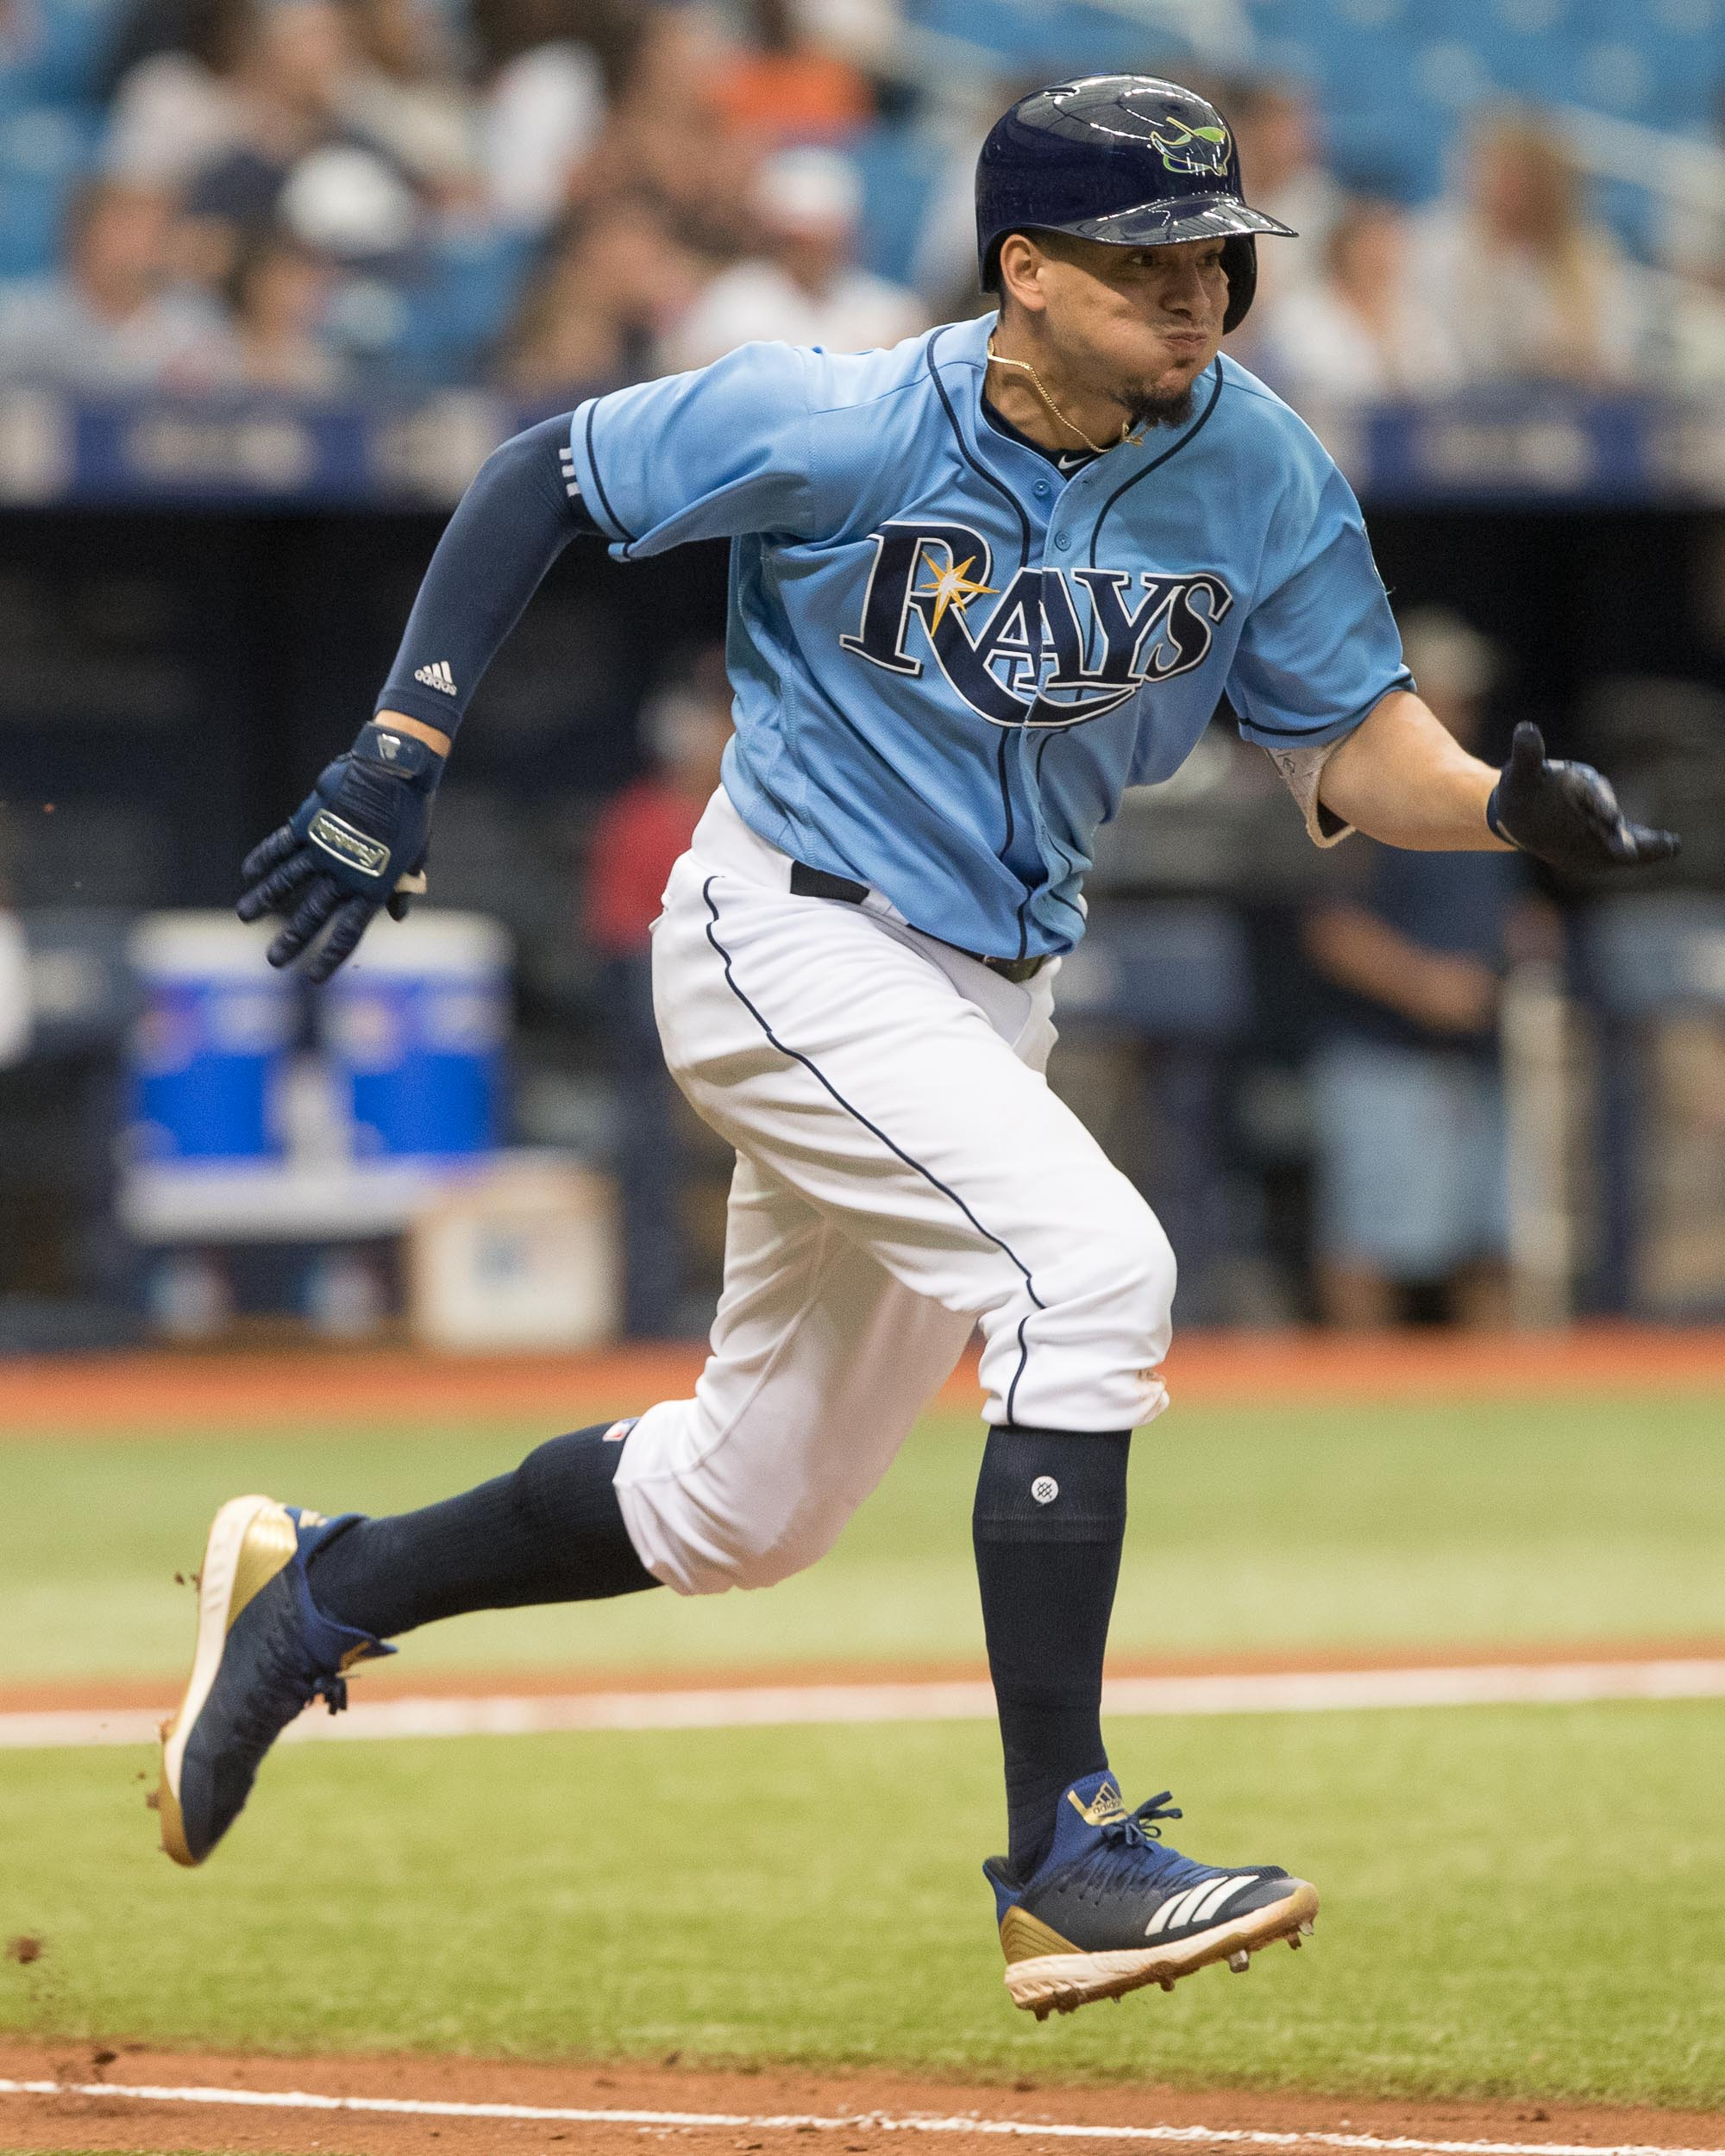 Gomez runs down the first-base line./STEVEM MUNCIE